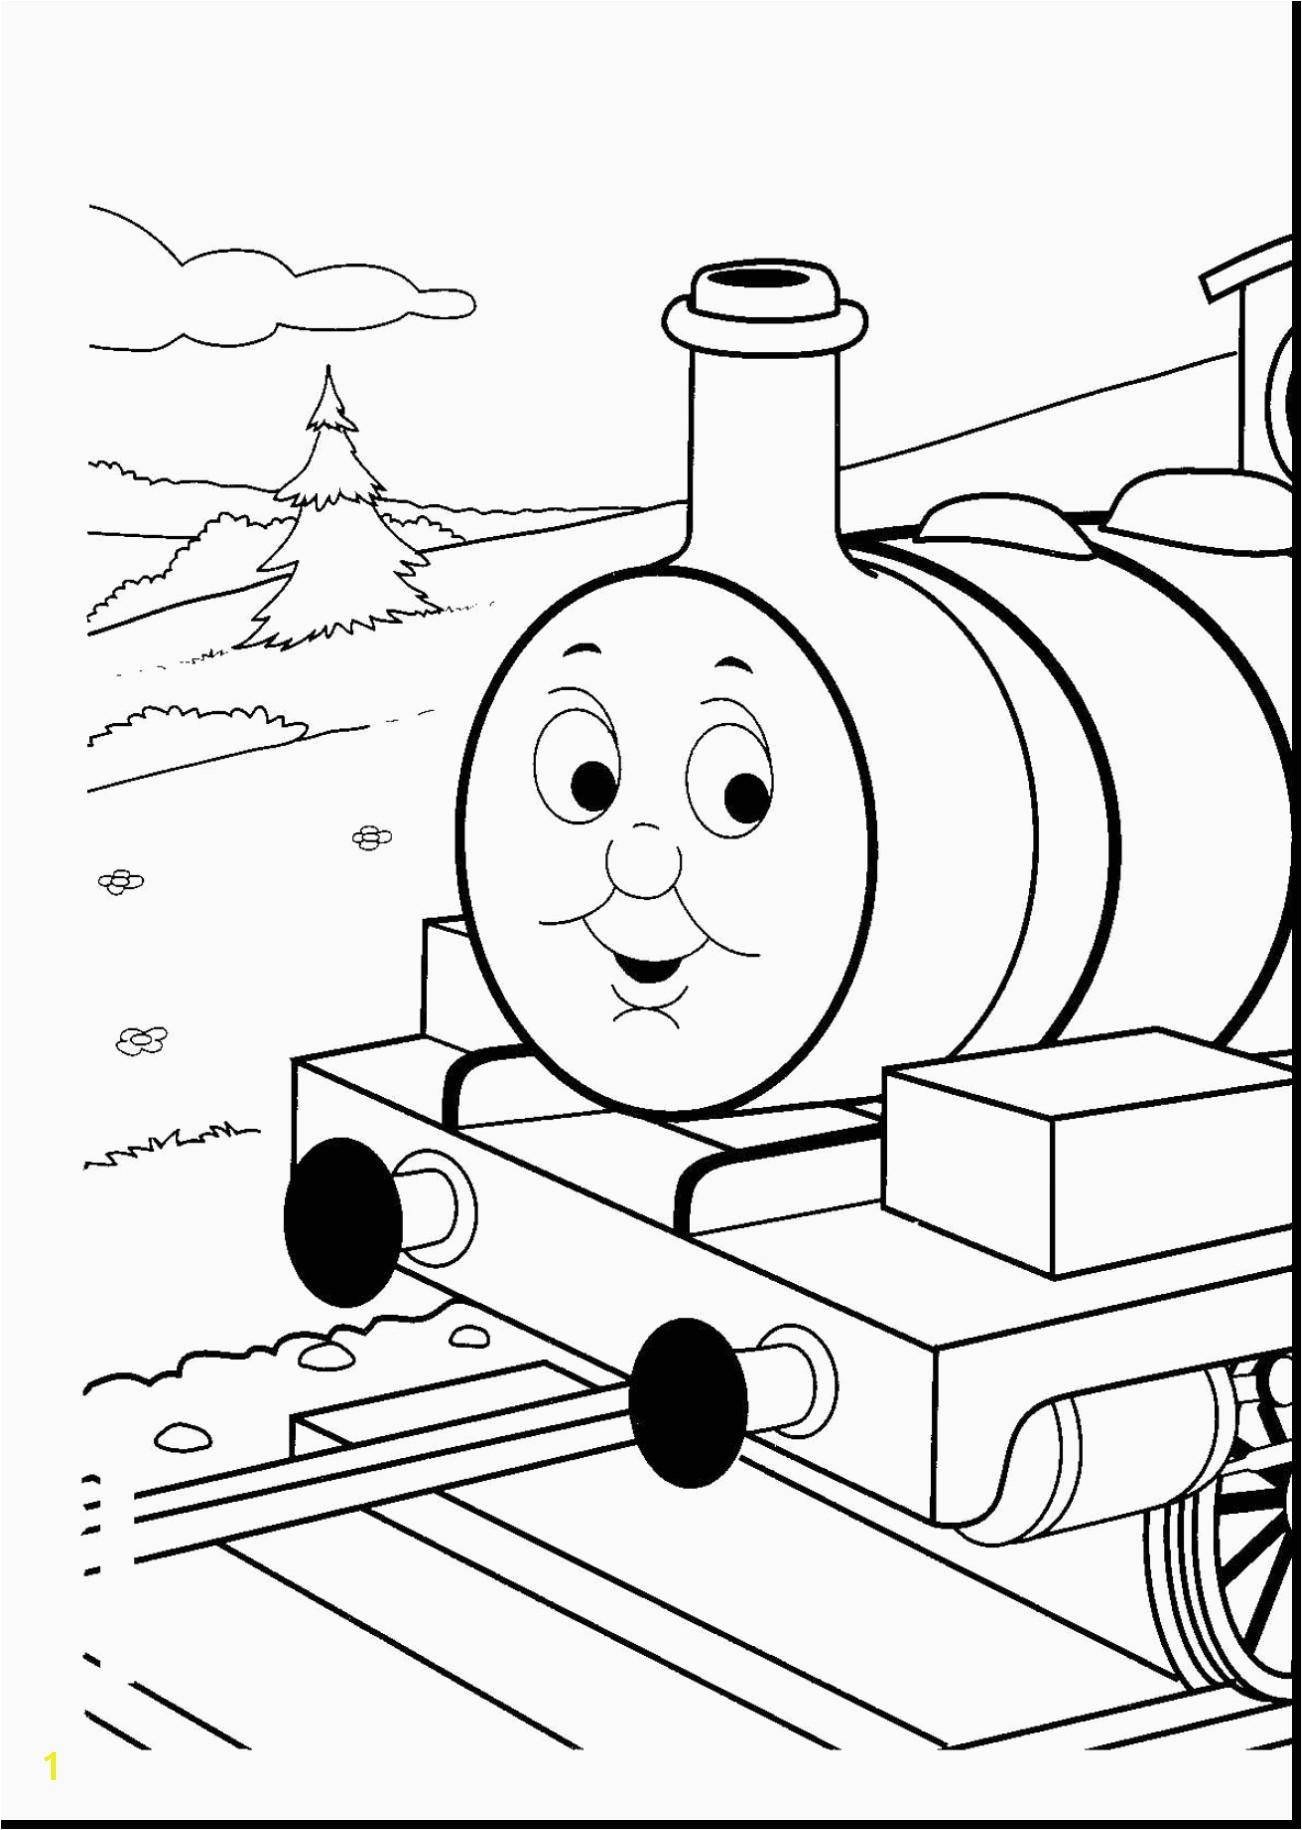 Thomas Train Coloring Pages Fresh Free Train Coloring Pages Awesome Thomas Train Drawing at